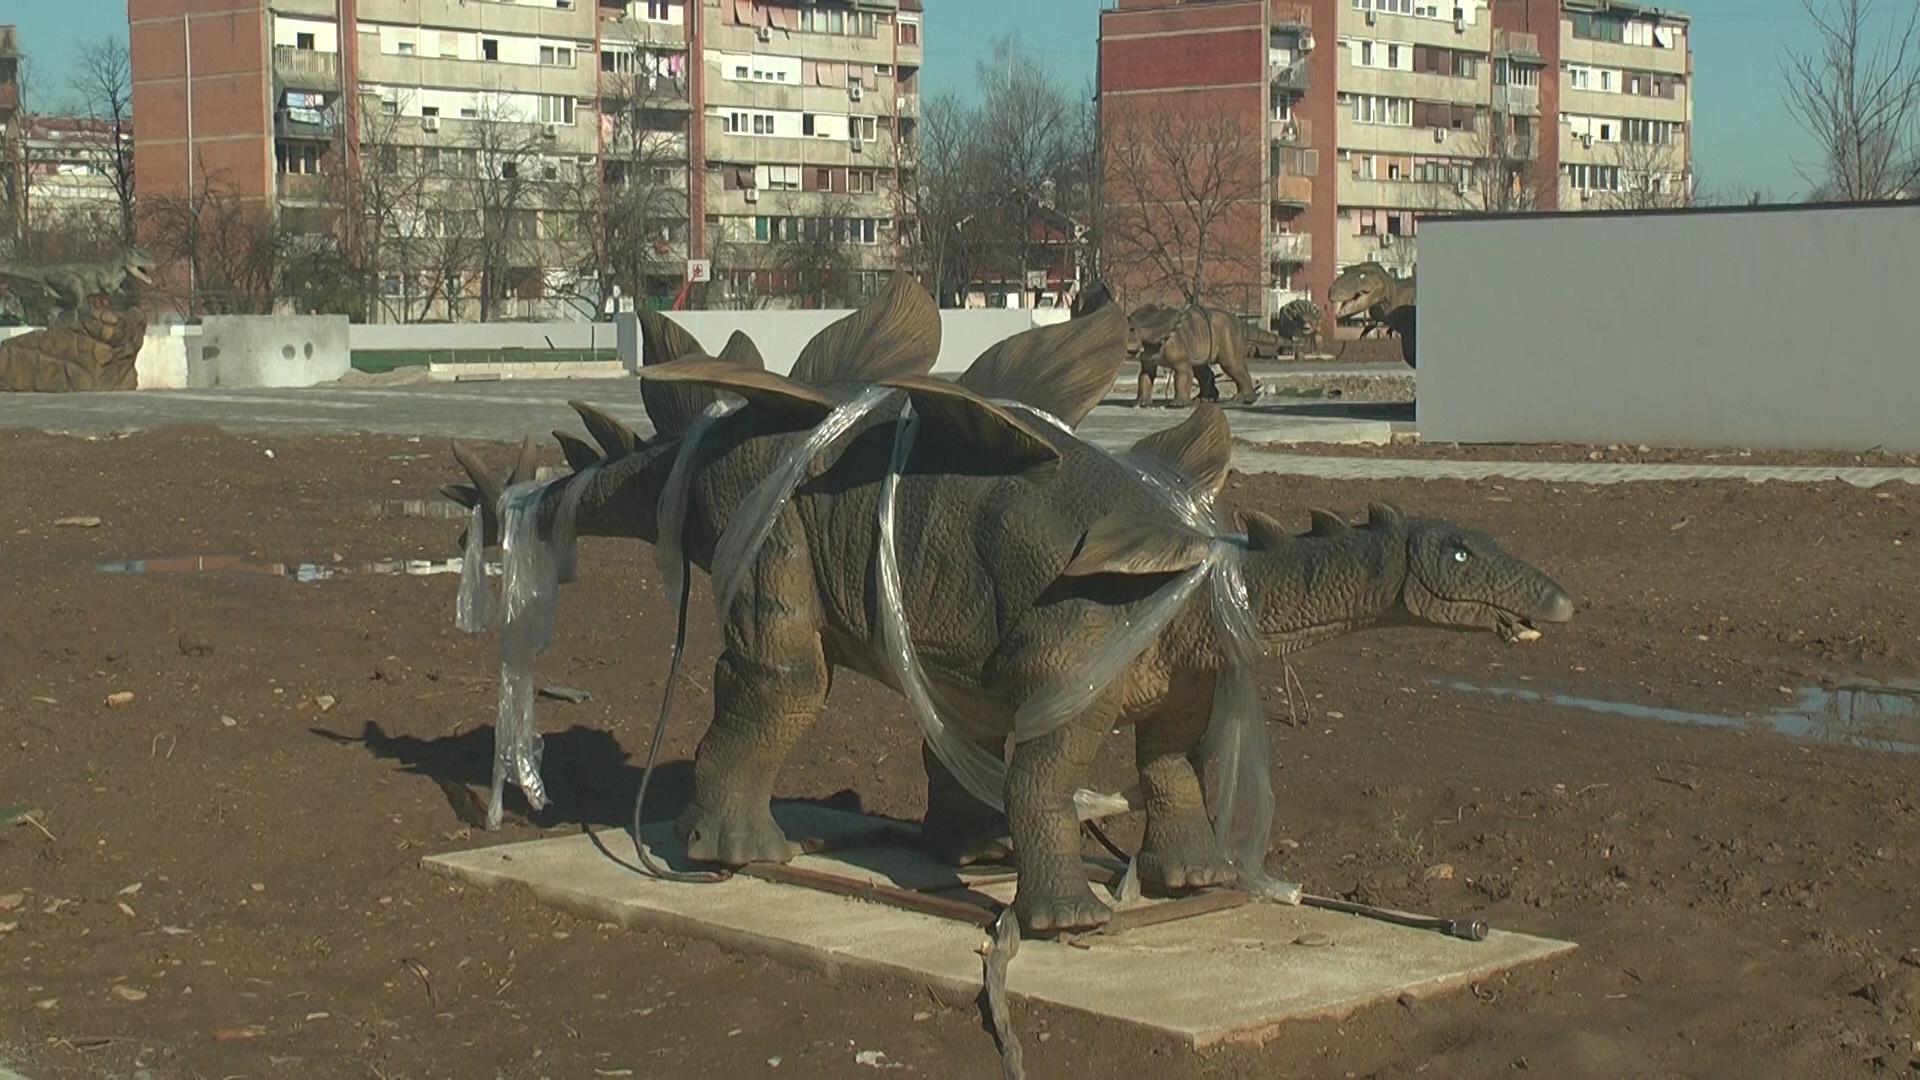 Ministarstvo trgovine, turizma i telekomunikacija odobrilo sredstva za nastavak izgradnje Zabavnog parka Šarengrad